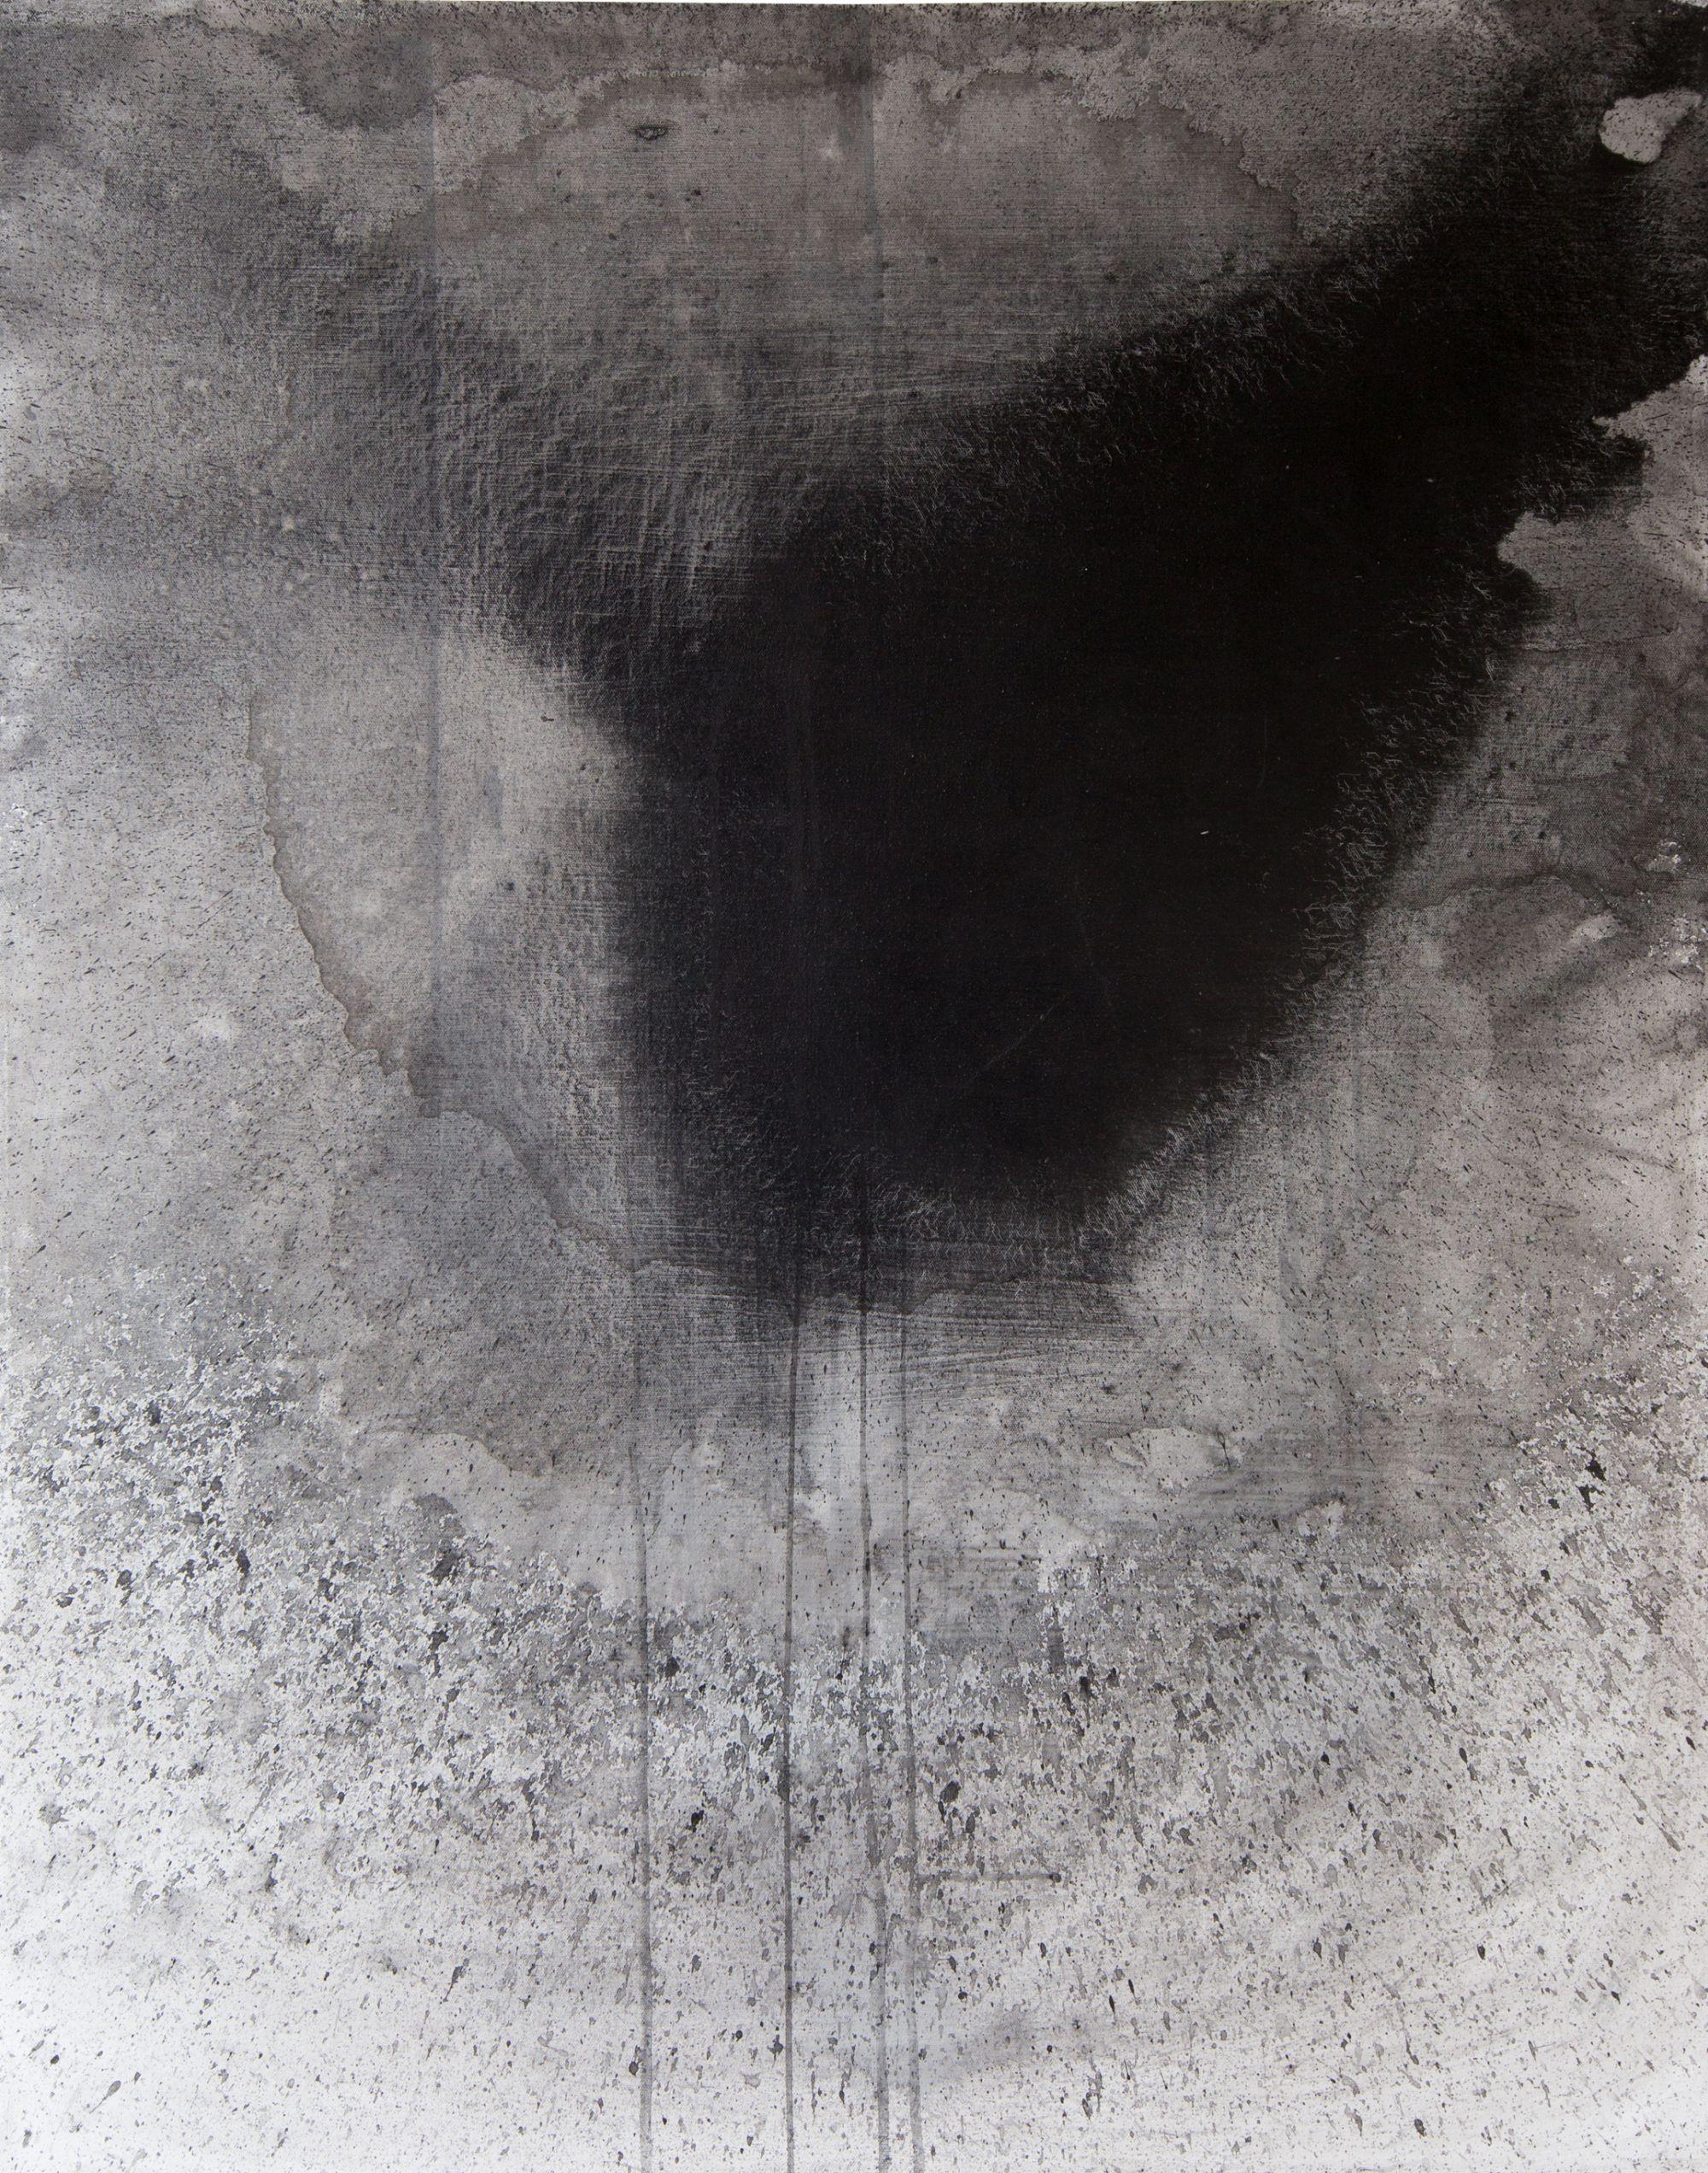 Untitled (black heron)